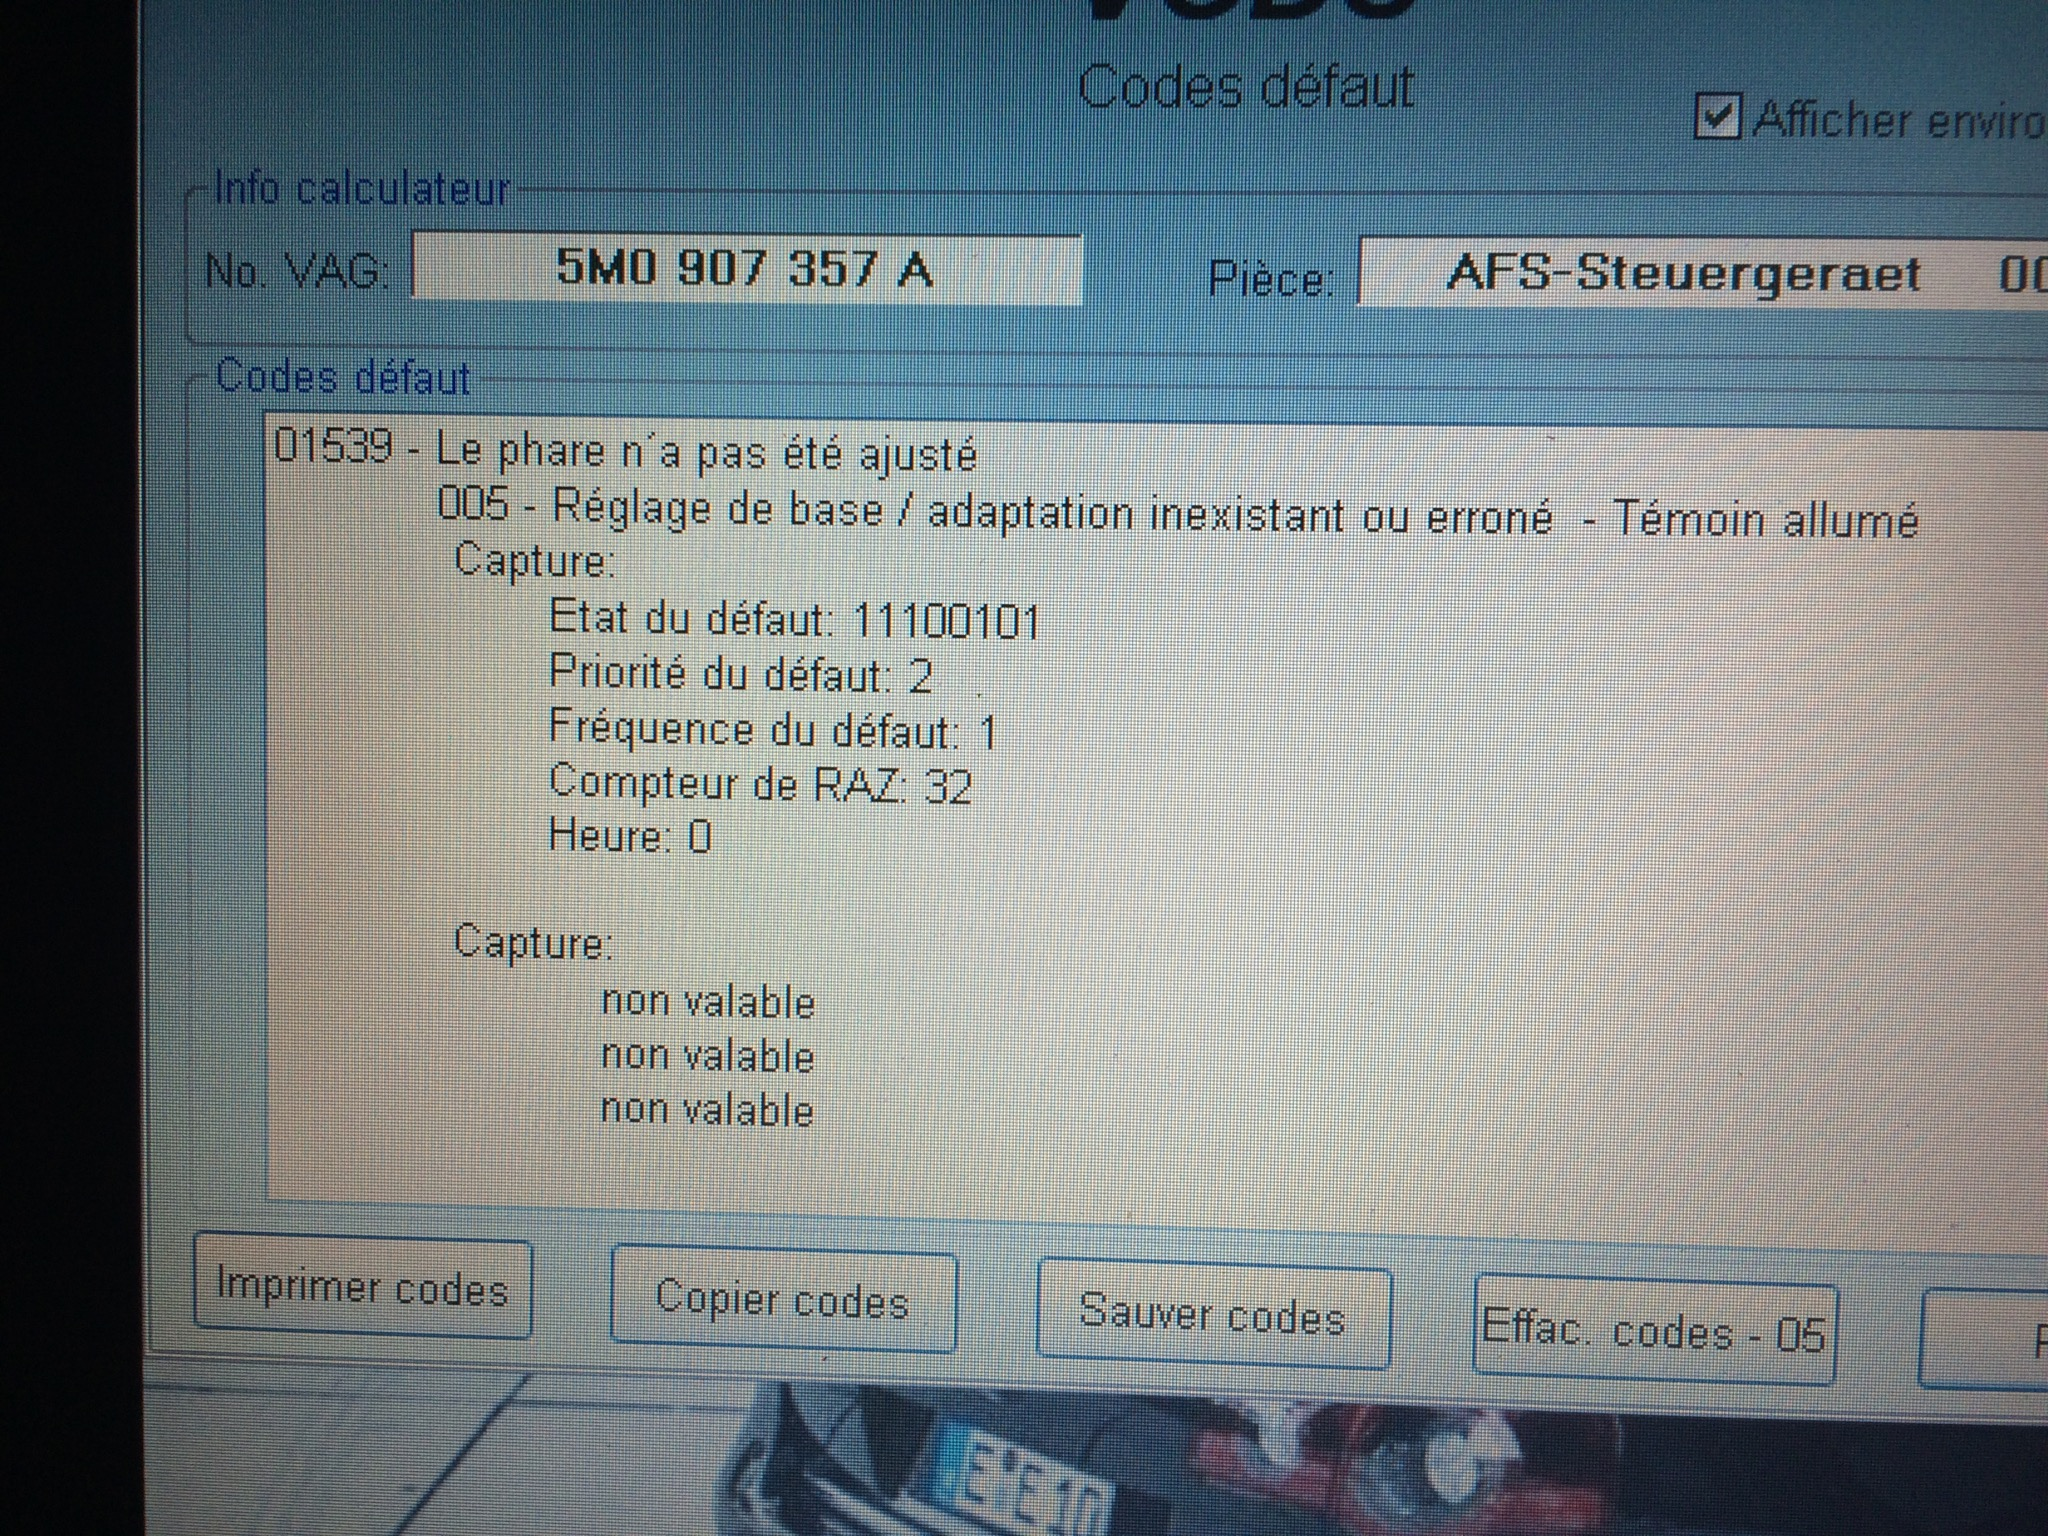 http://nsa37.casimages.com/img/2016/07/17/160717125830309007.jpg